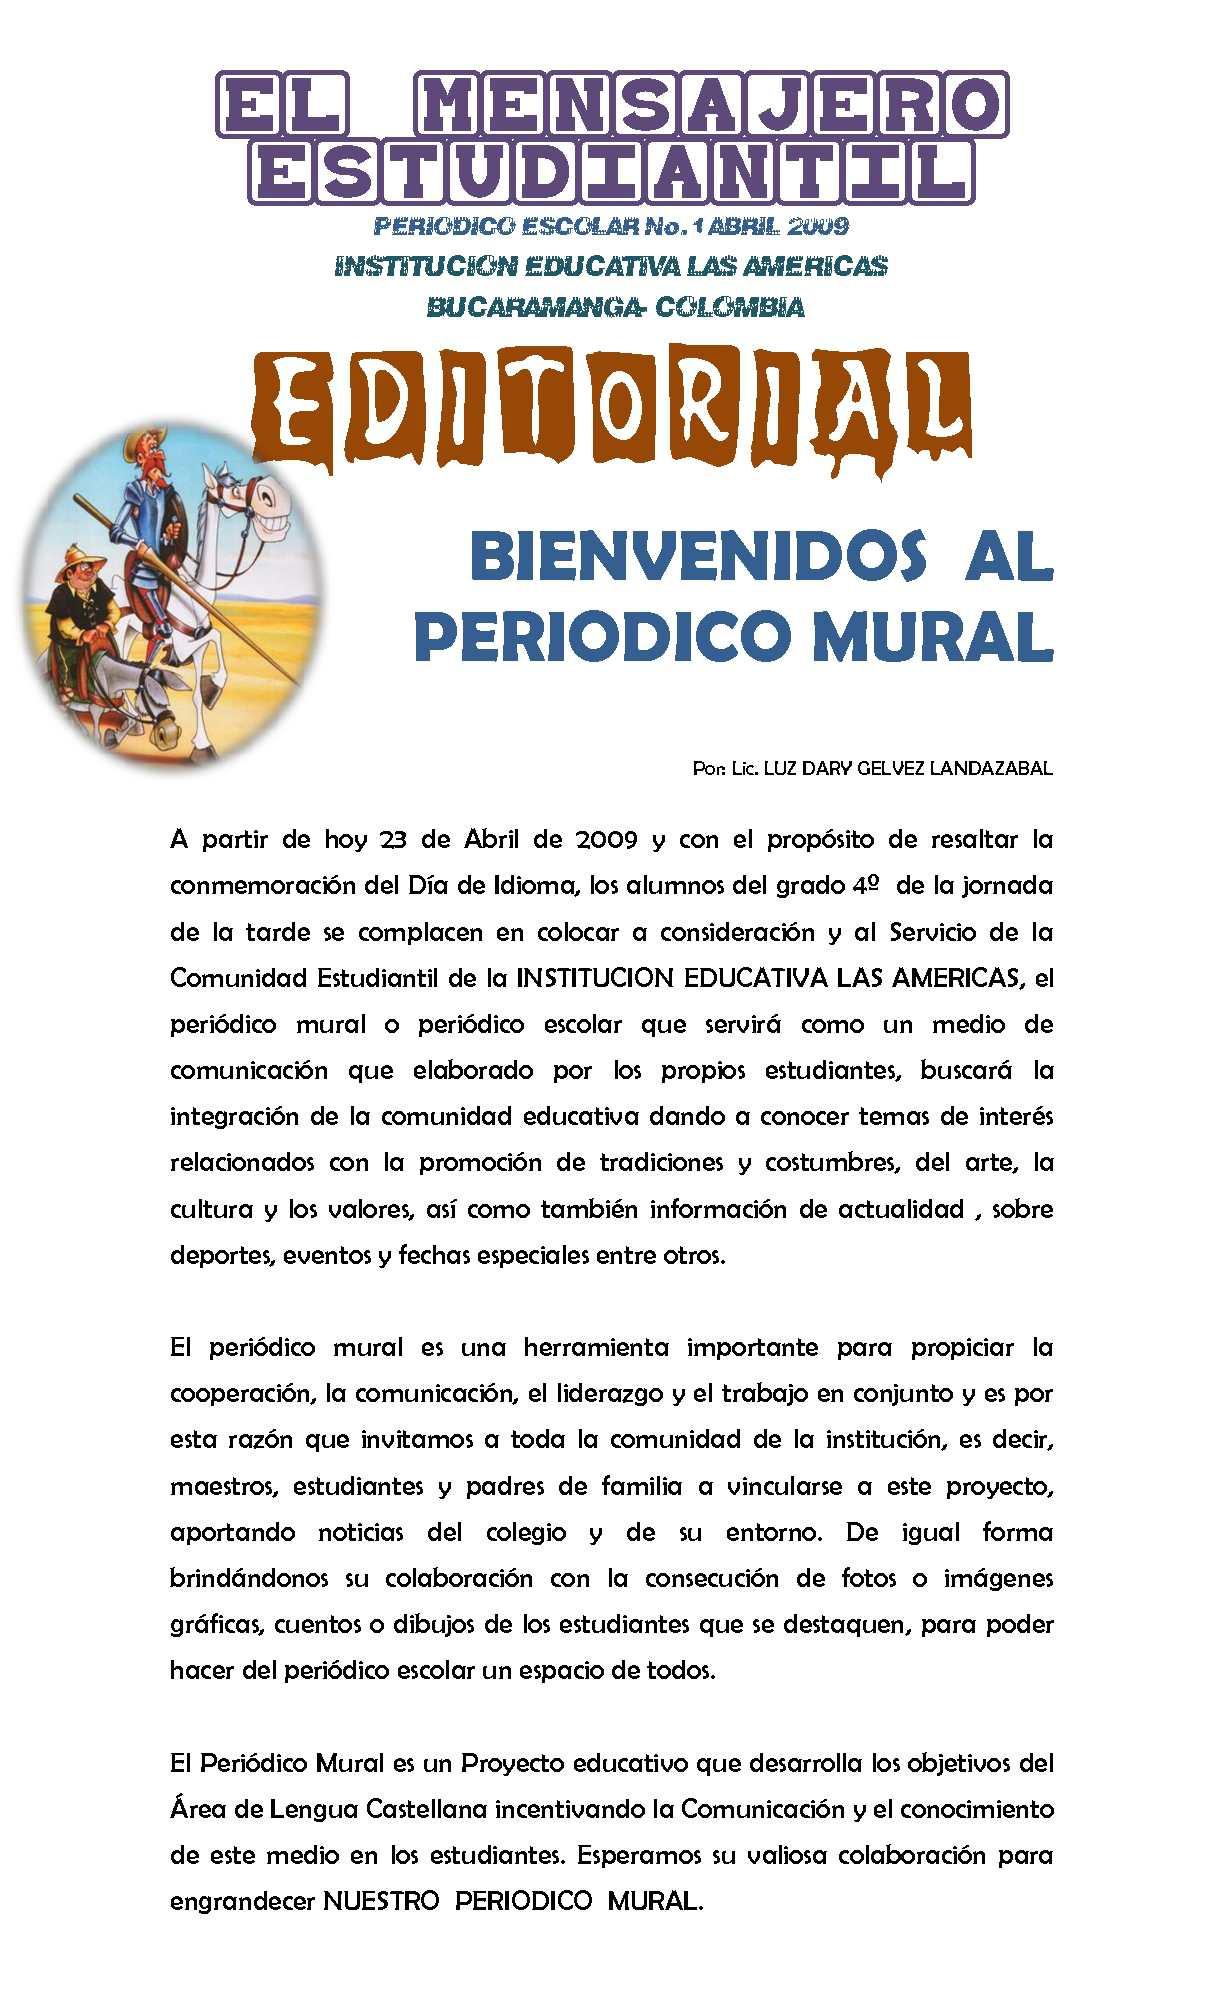 Ejemplo de editorial de un periodico mural escolar peri for El periodico mural wikipedia